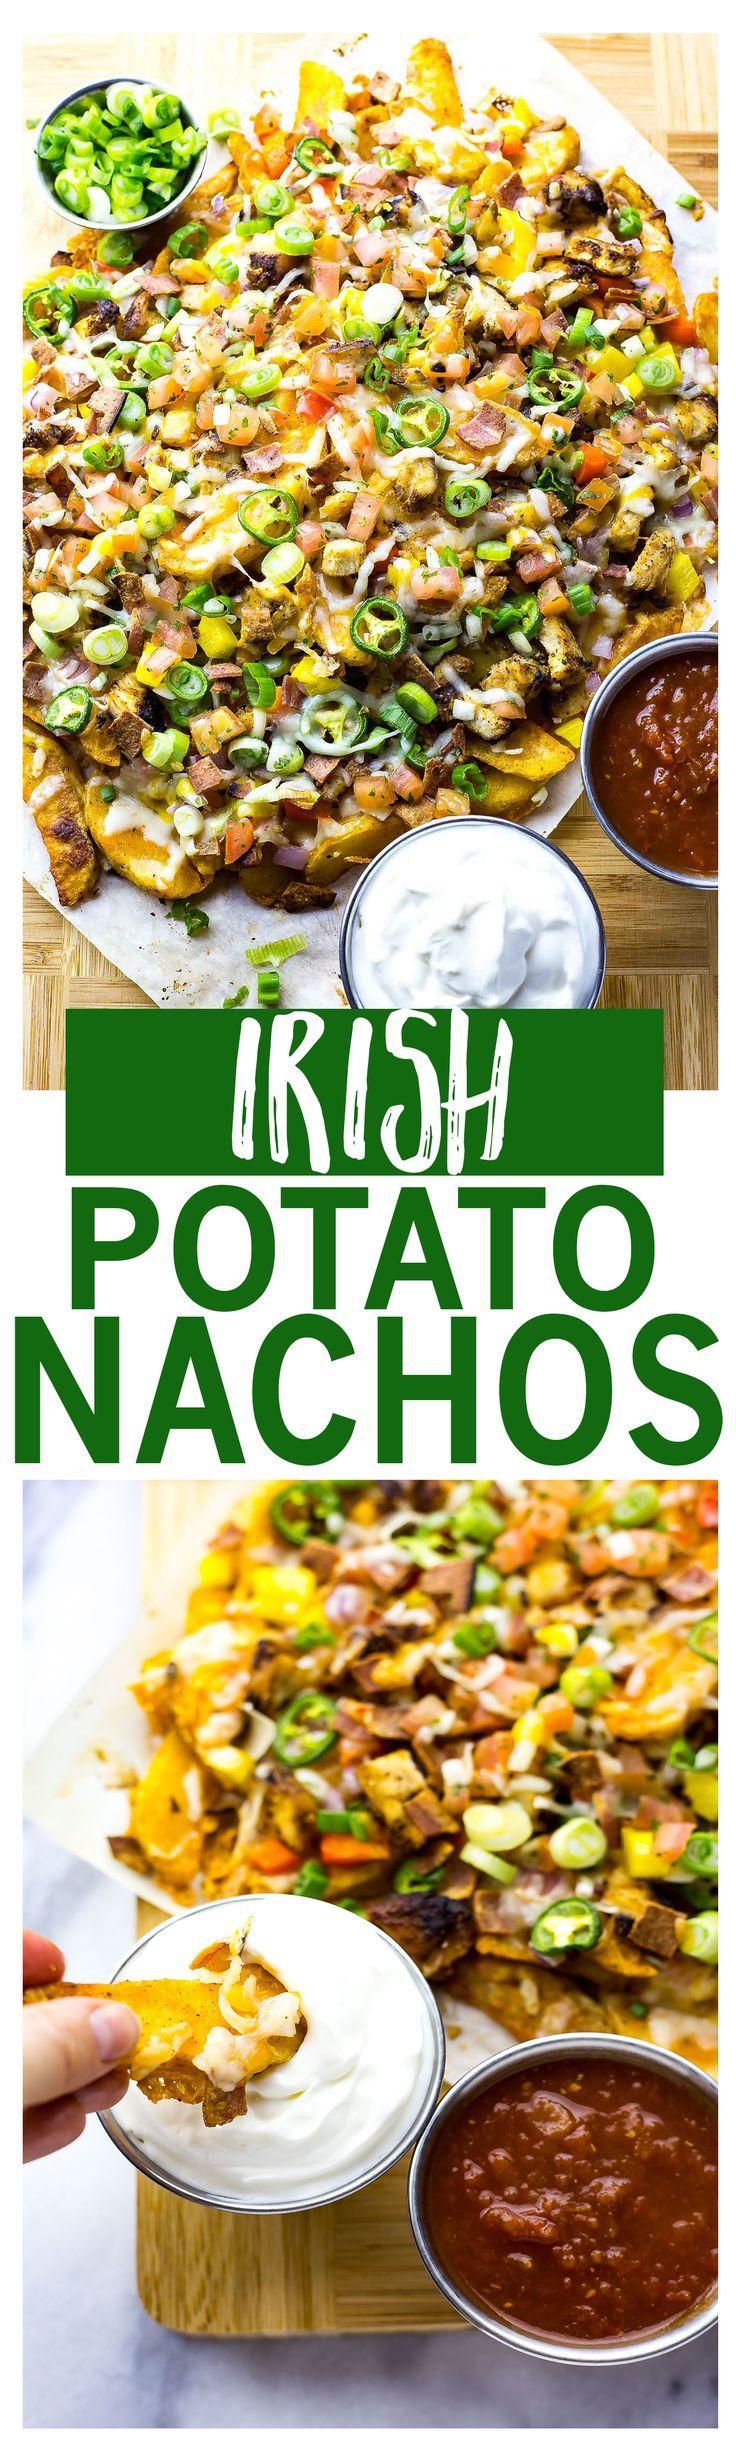 30-Minute Irish Potato Nachos are such a fun way to celebrate St. Patrick's Day, and a healthier way to enjoy pub grub!